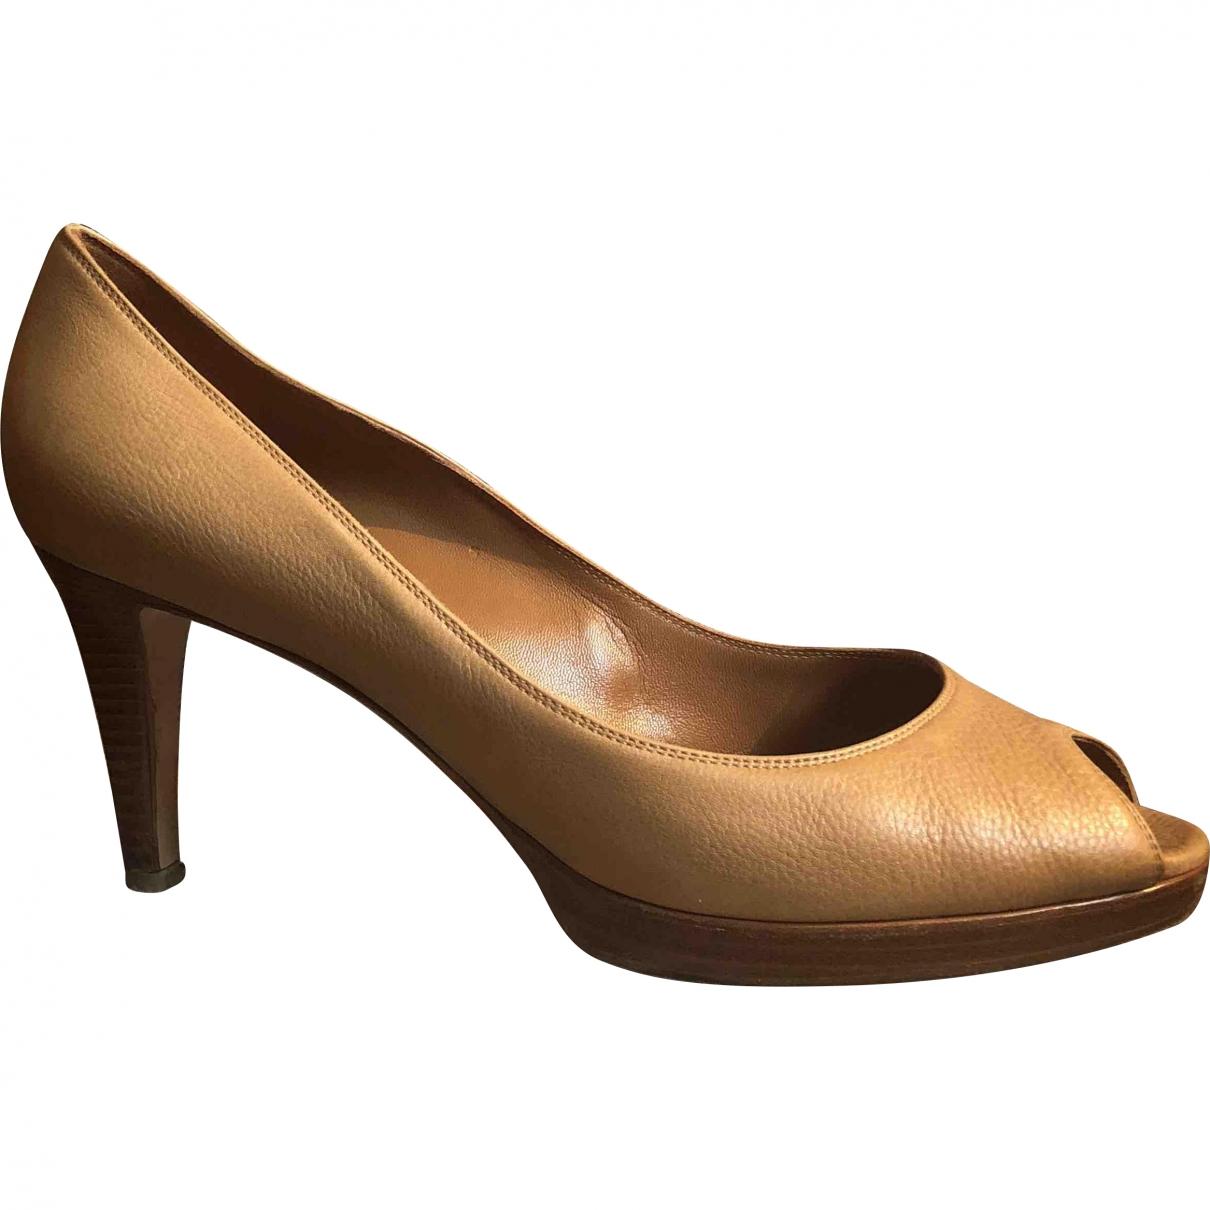 Gianvito Rossi - Escarpins   pour femme en cuir - beige